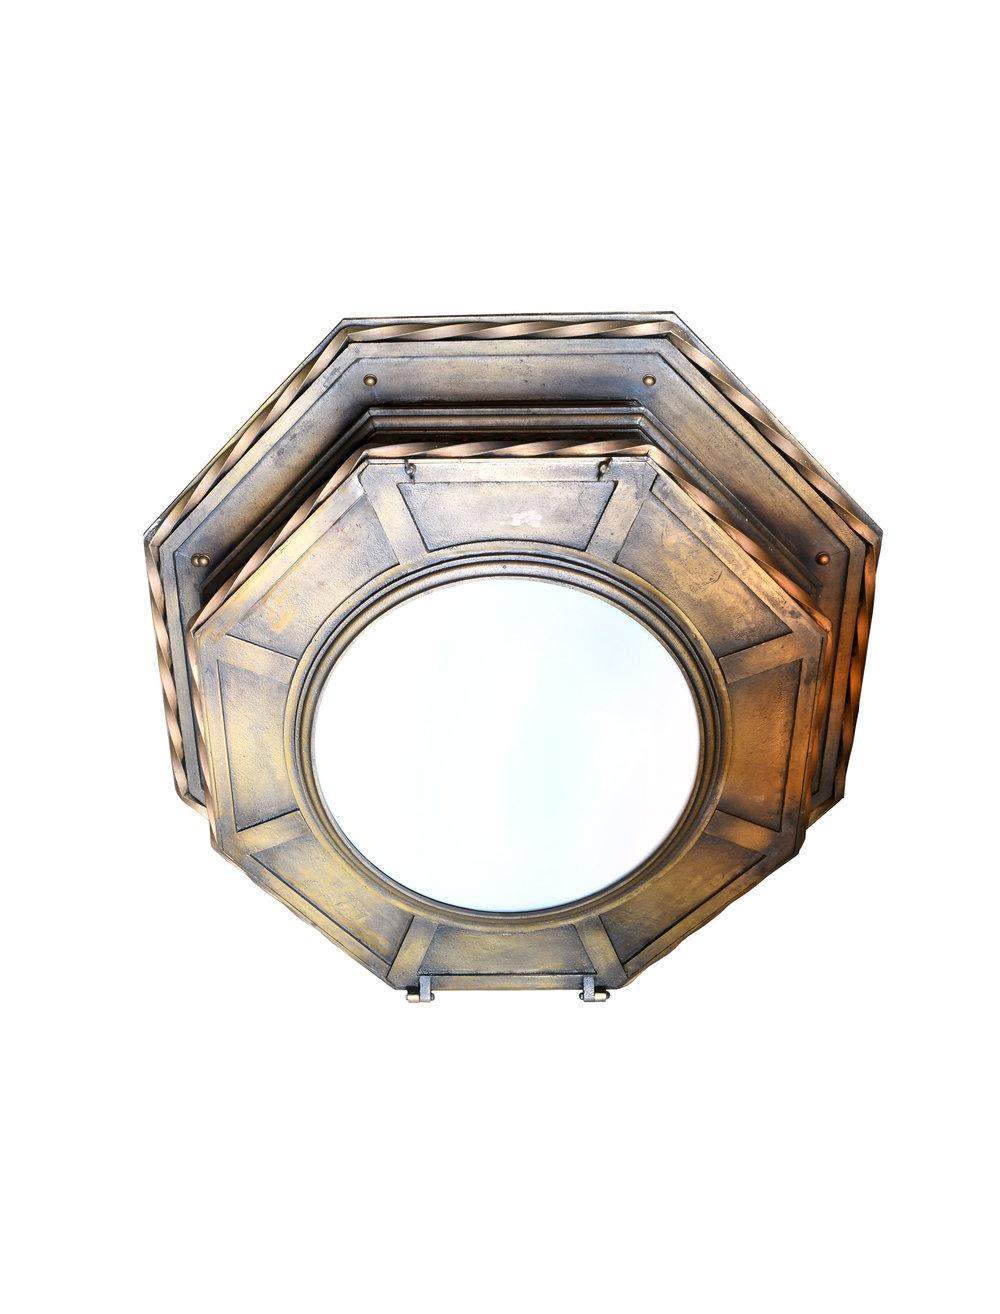 47785-octagonal-16-light-theater-flush-mount-main.jpg